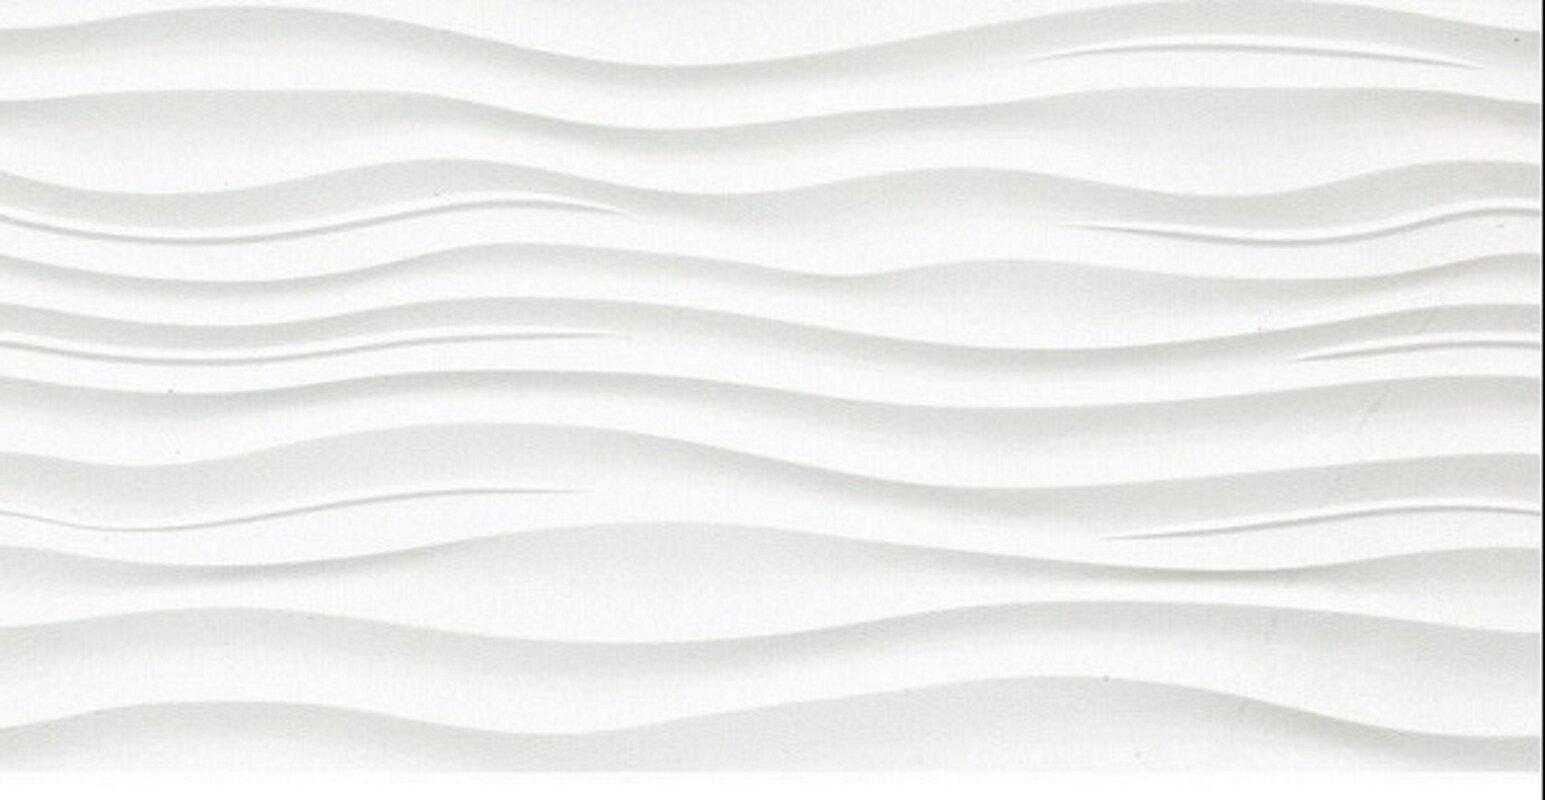 Surface 12 X 24 Porcelain Tile In Ripple White